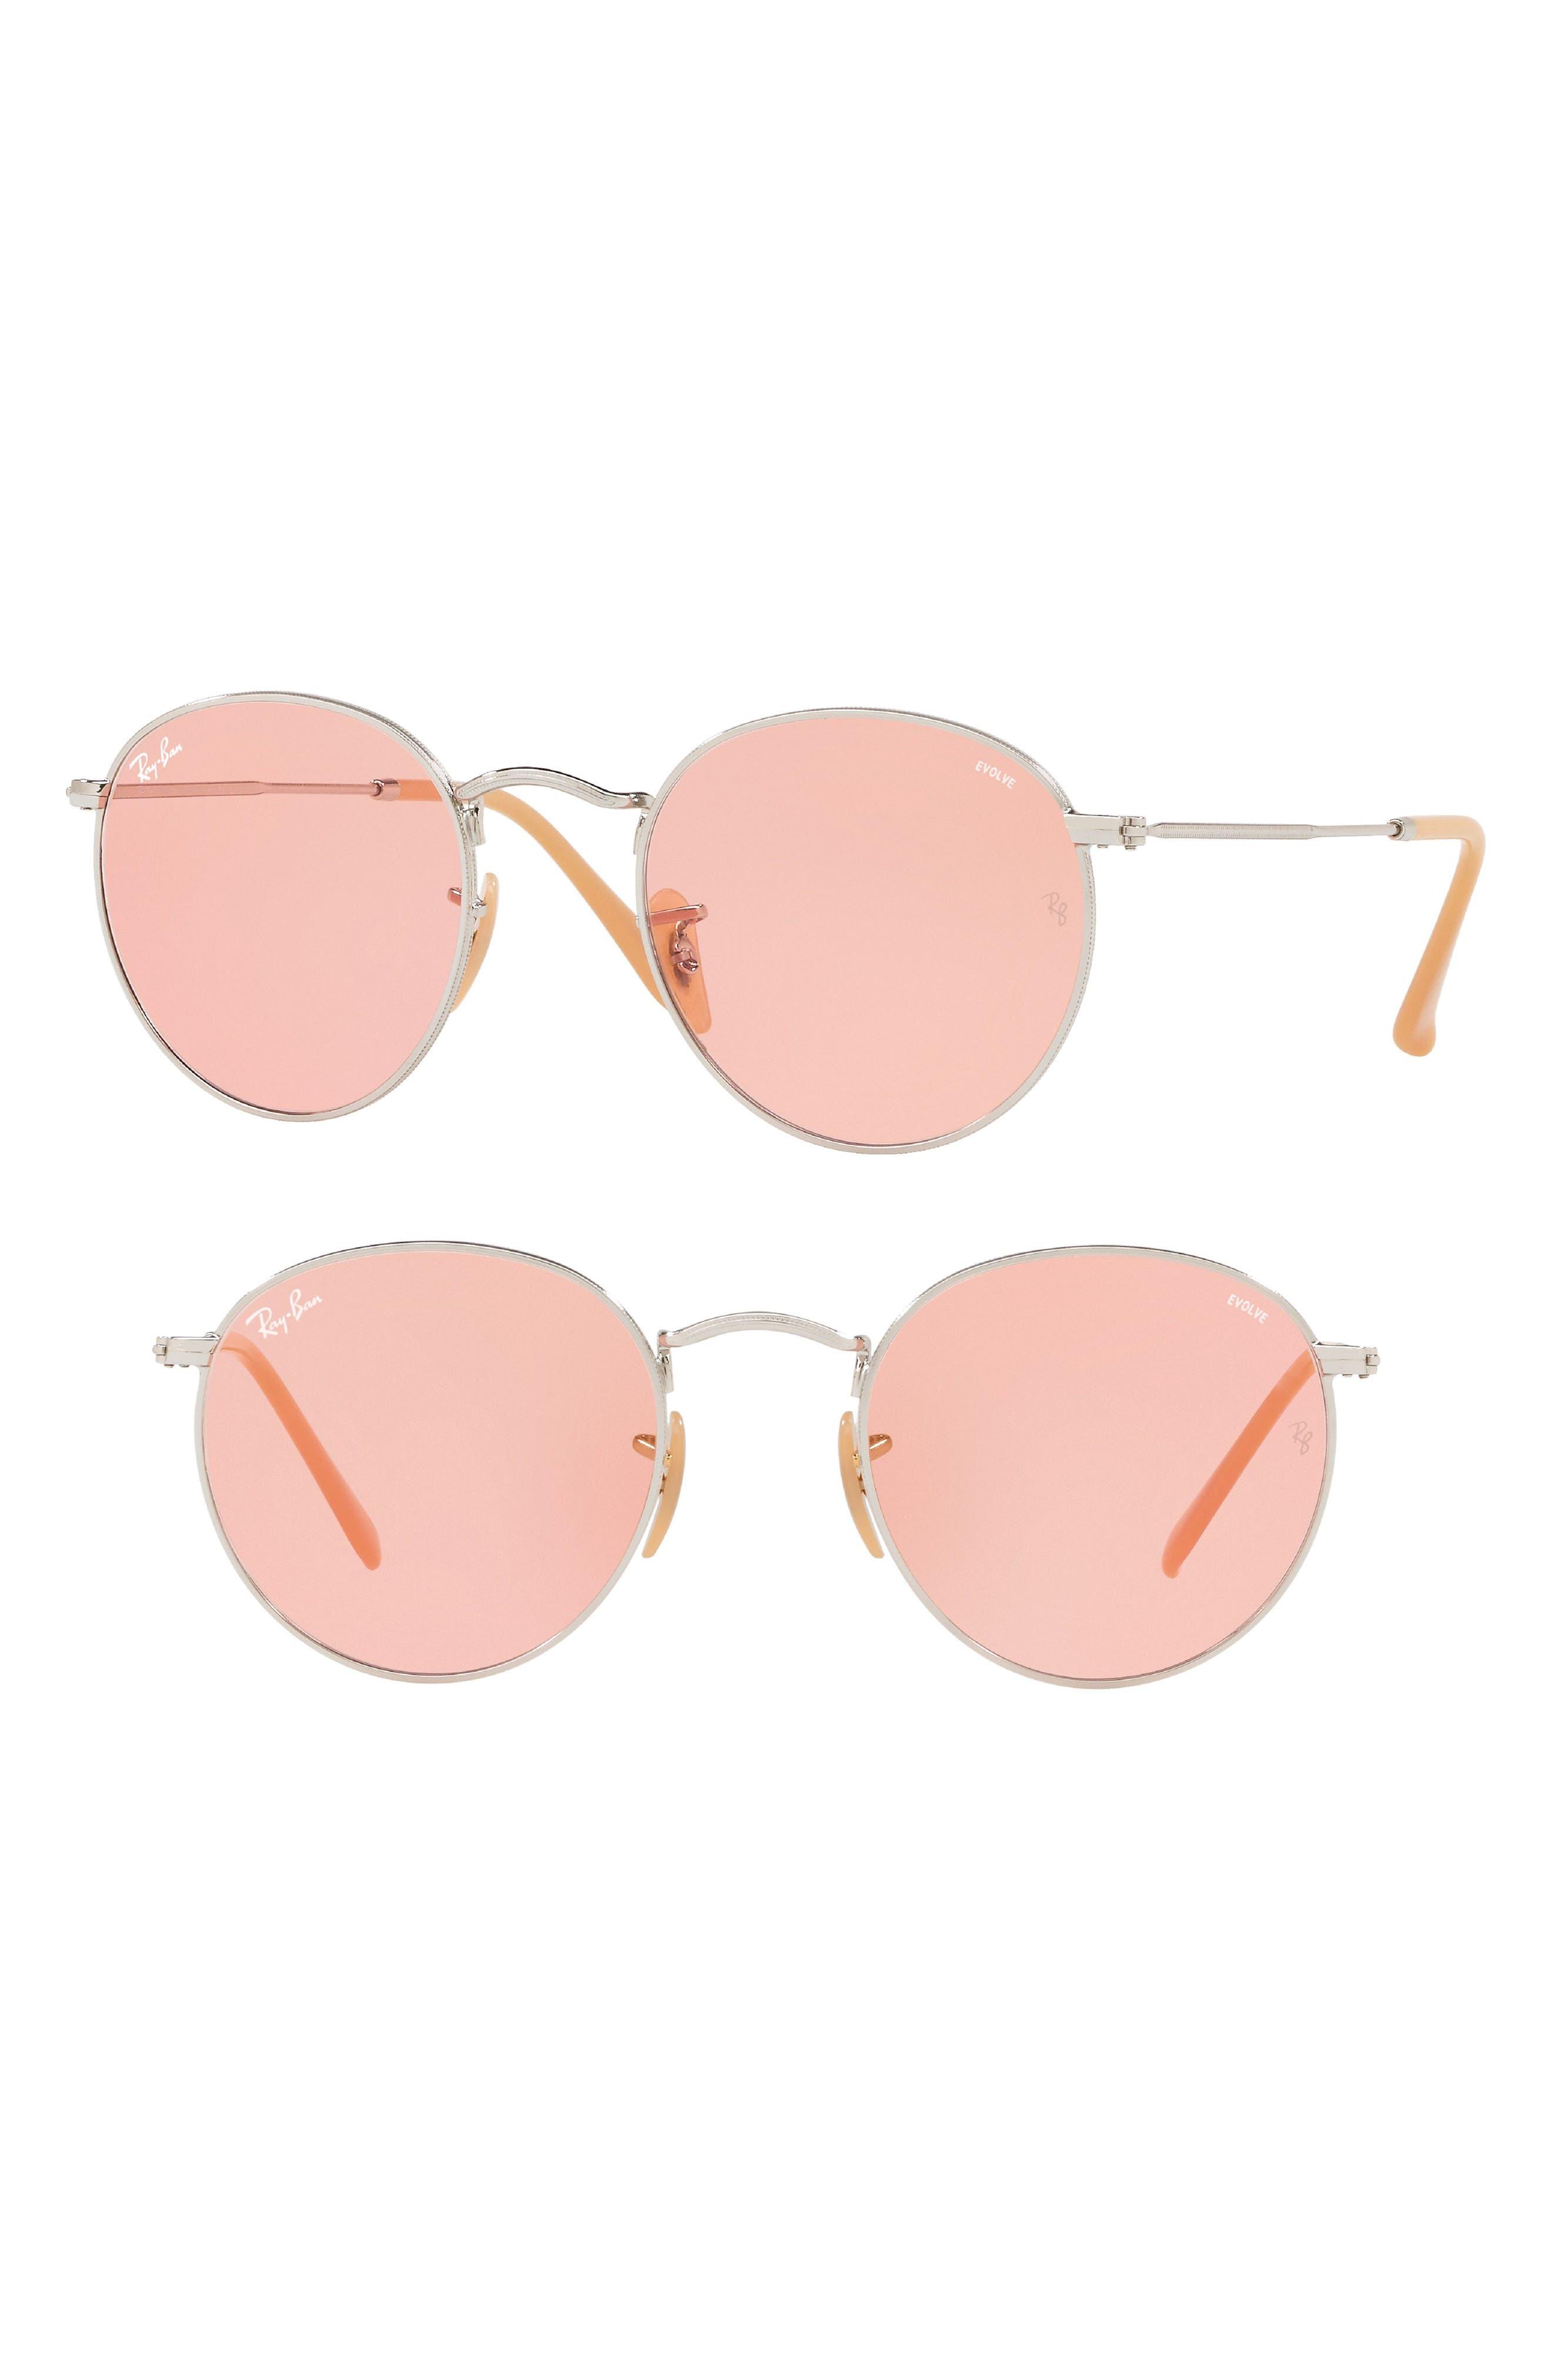 513116a8f7 ... denmark ray ban 53mm evolve photochromic round sunglasses 40b7d a96b4